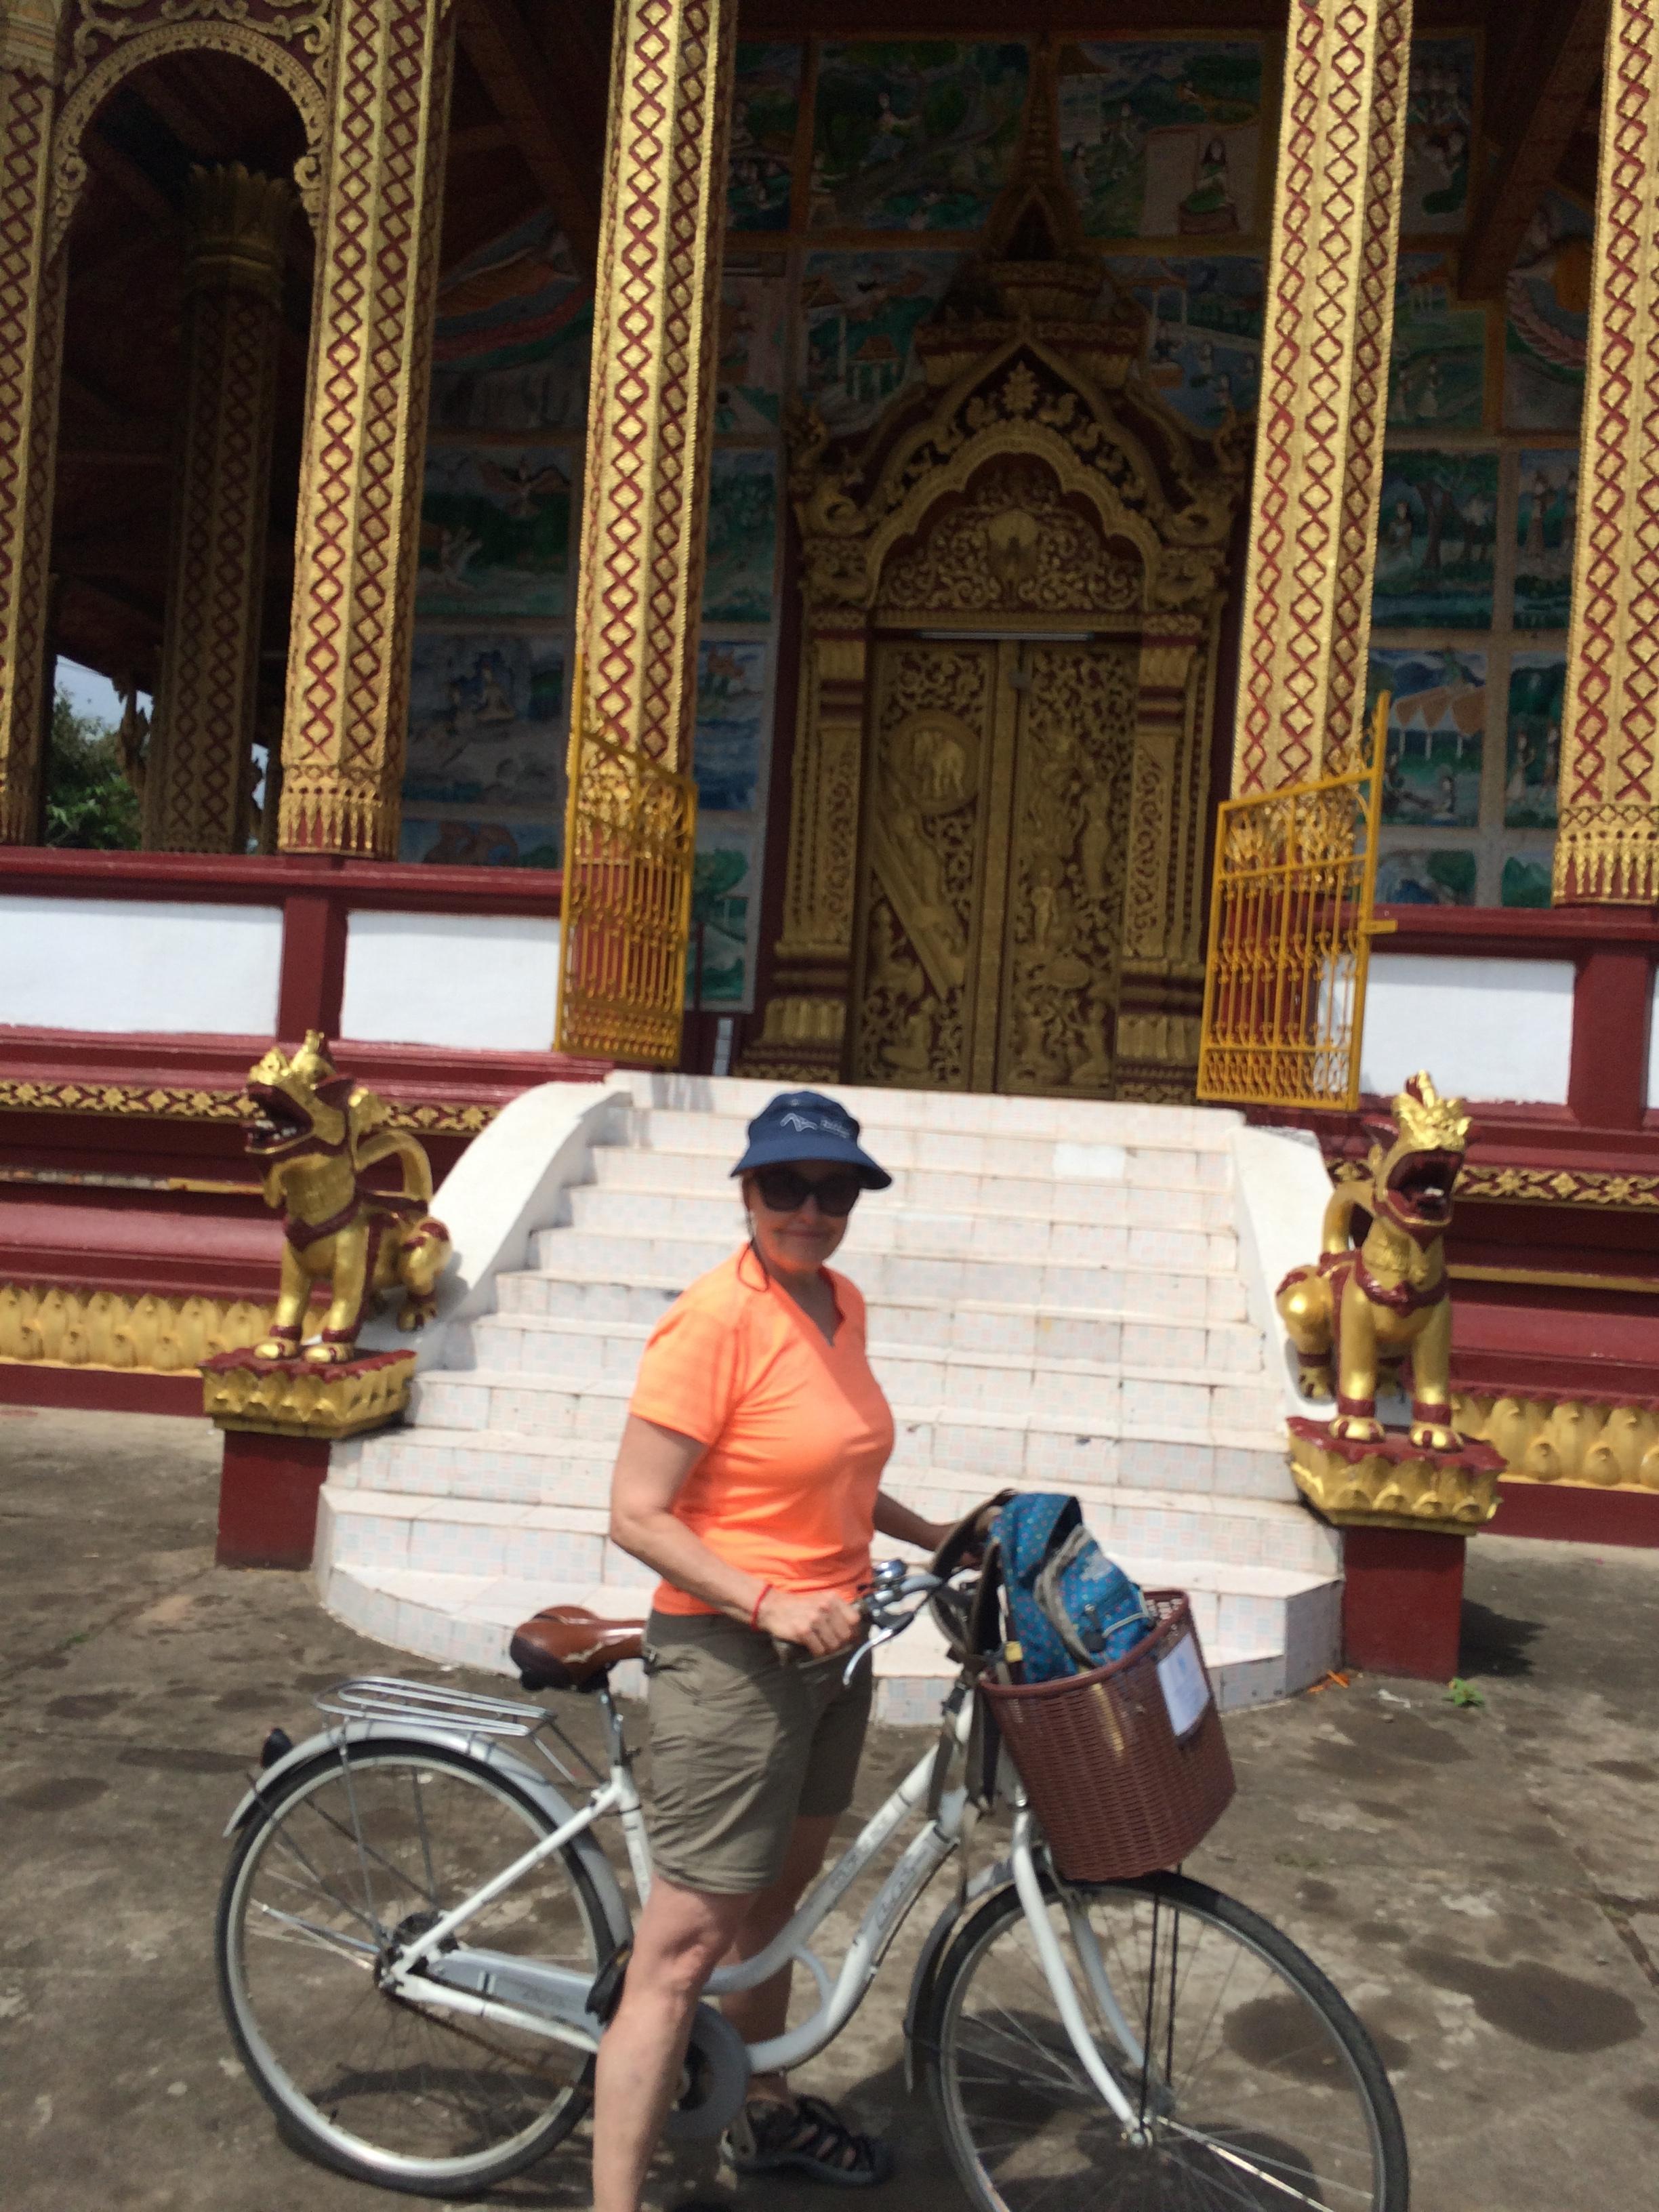 Our bike trip around the Wats